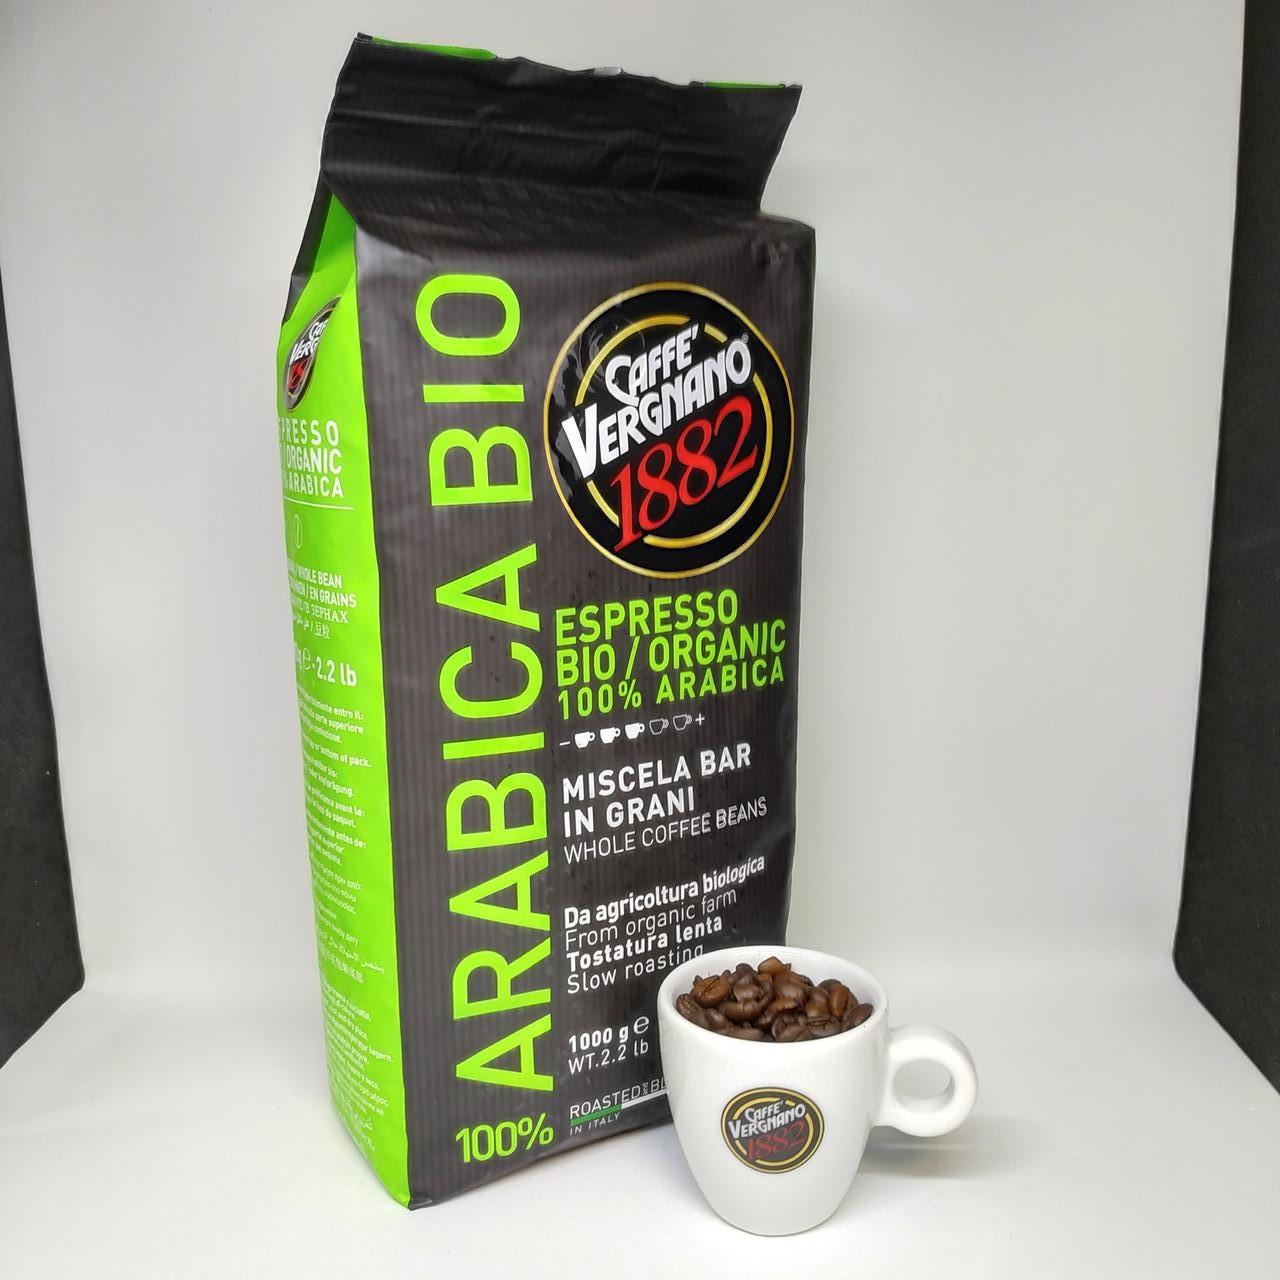 Caffe Vergnano 1882 Arabica bio - Кофе в зернах